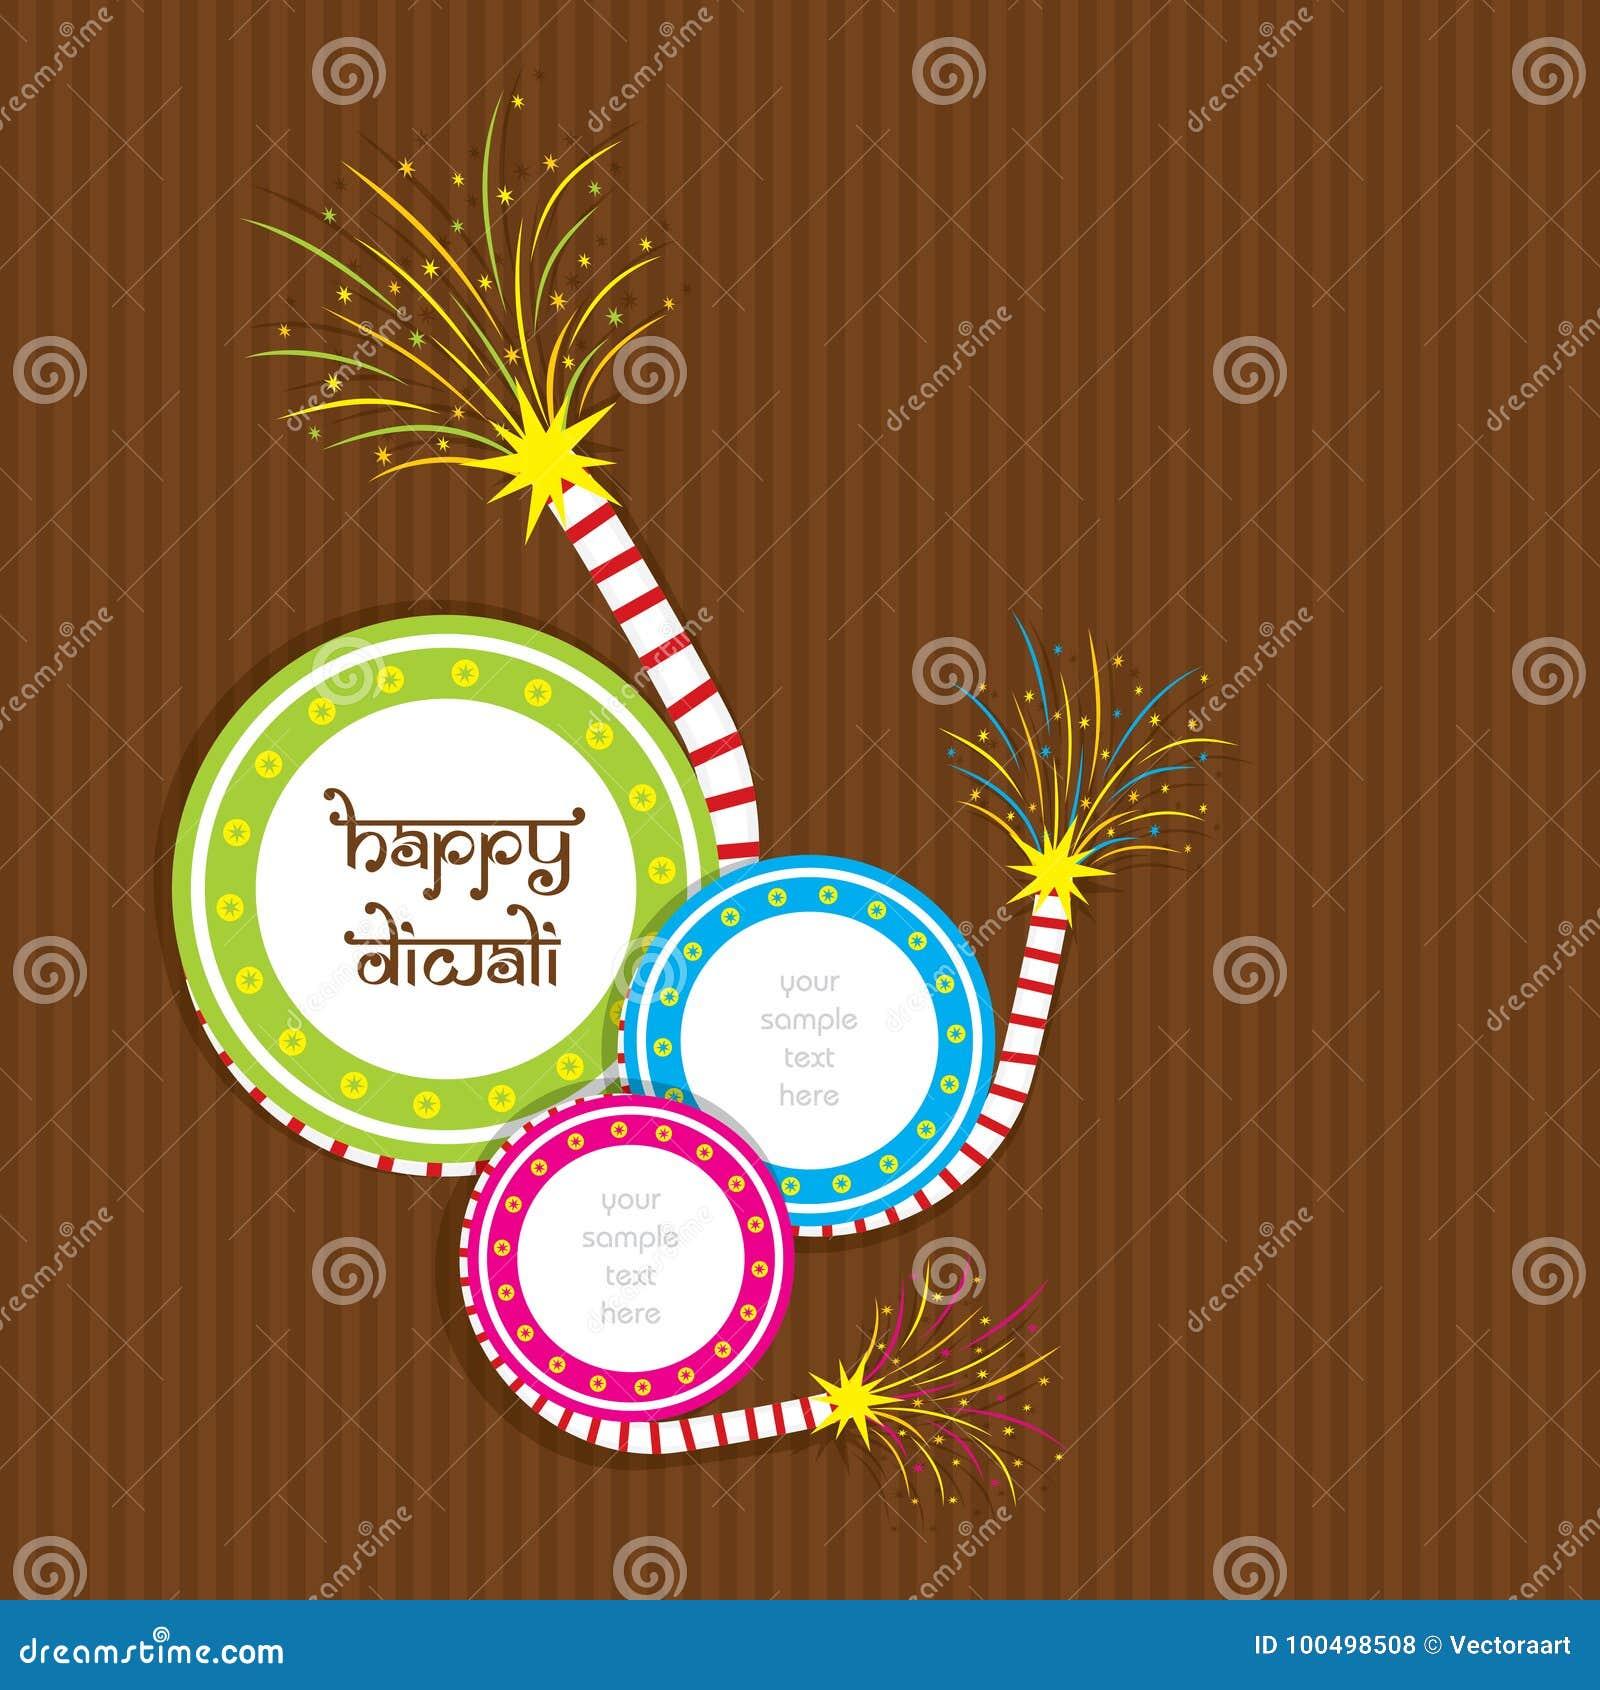 Happy New Year And Happy Diwali 58